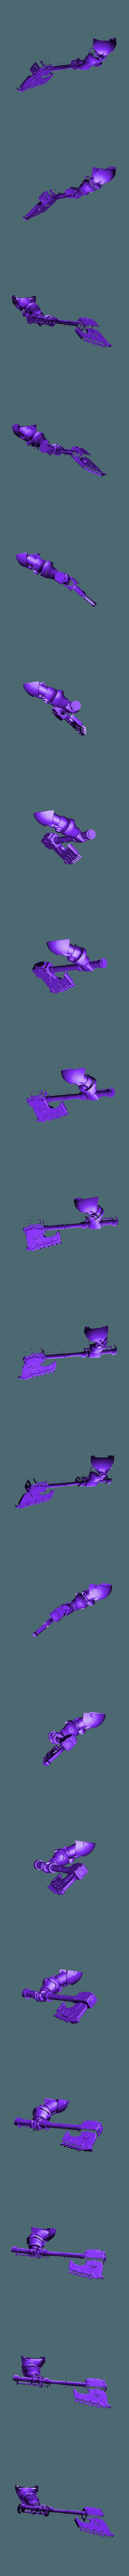 CSM_Terminator_Chainaxe_v4_Karnageking.stl Download free STL file Melee weapons for Chunky Elite Evil Space Mans • 3D print model, Tux_M